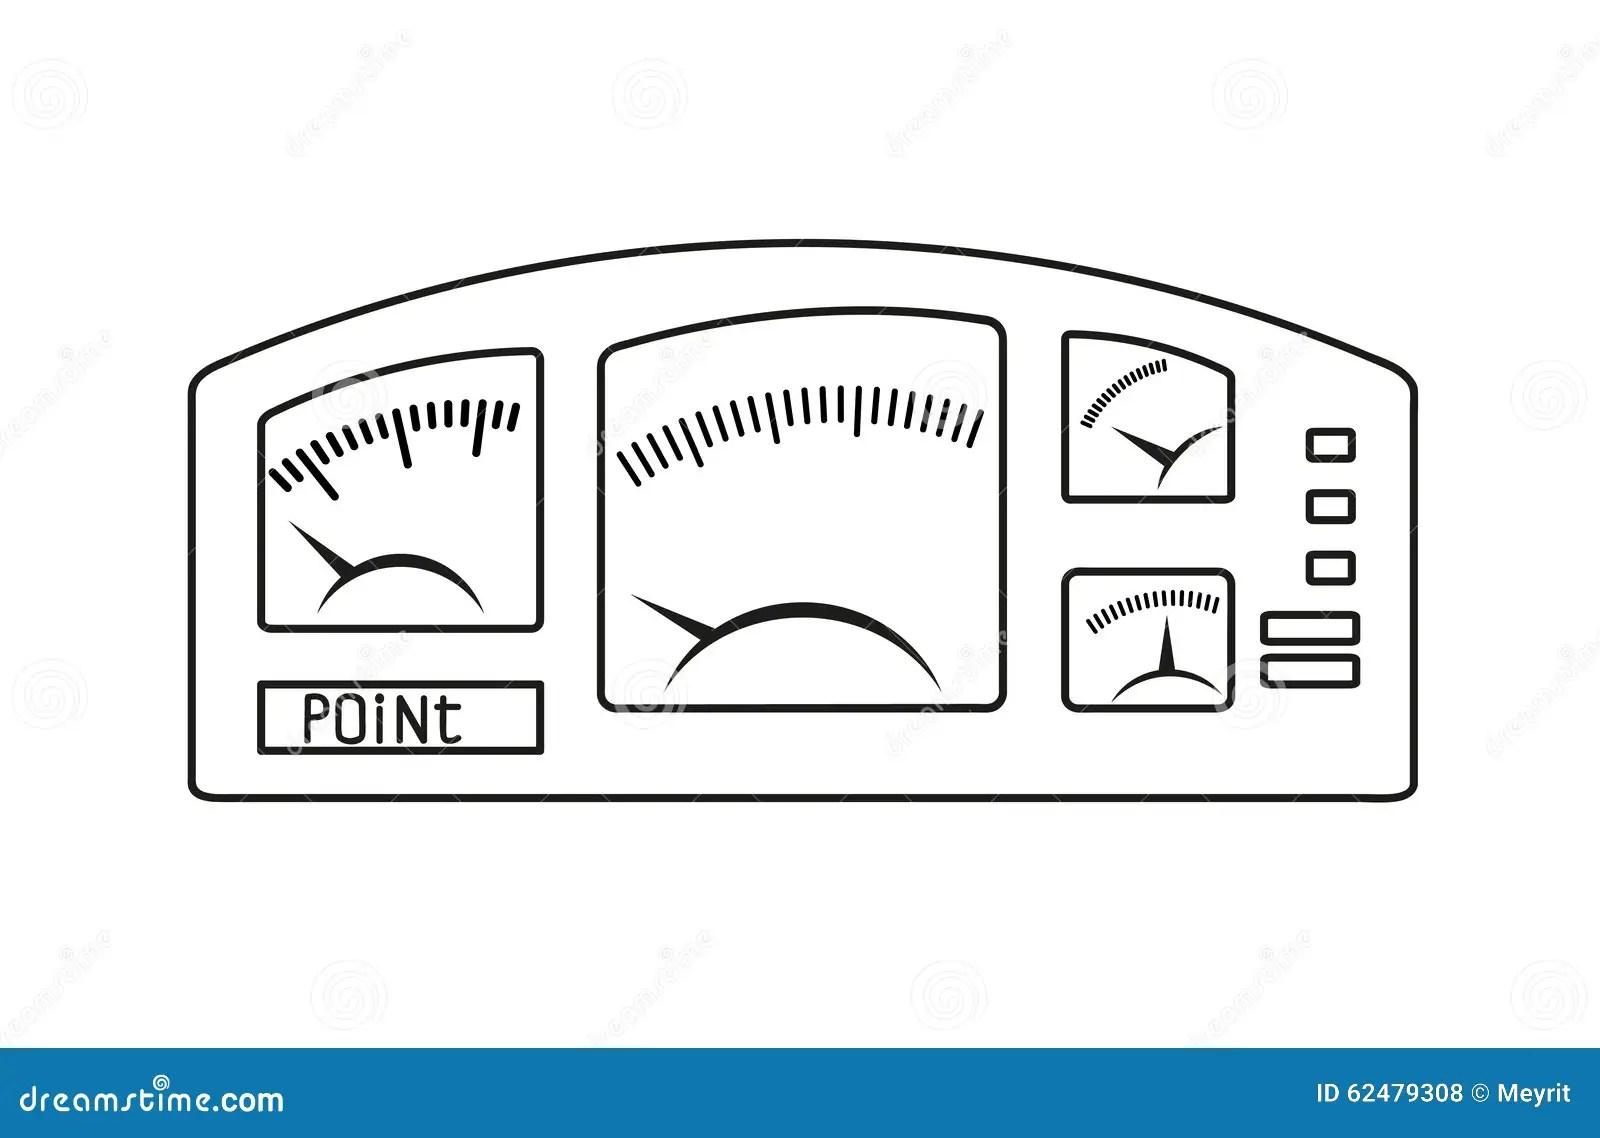 Vector Image Eps8 Stock Vector Illustration Of Odometer